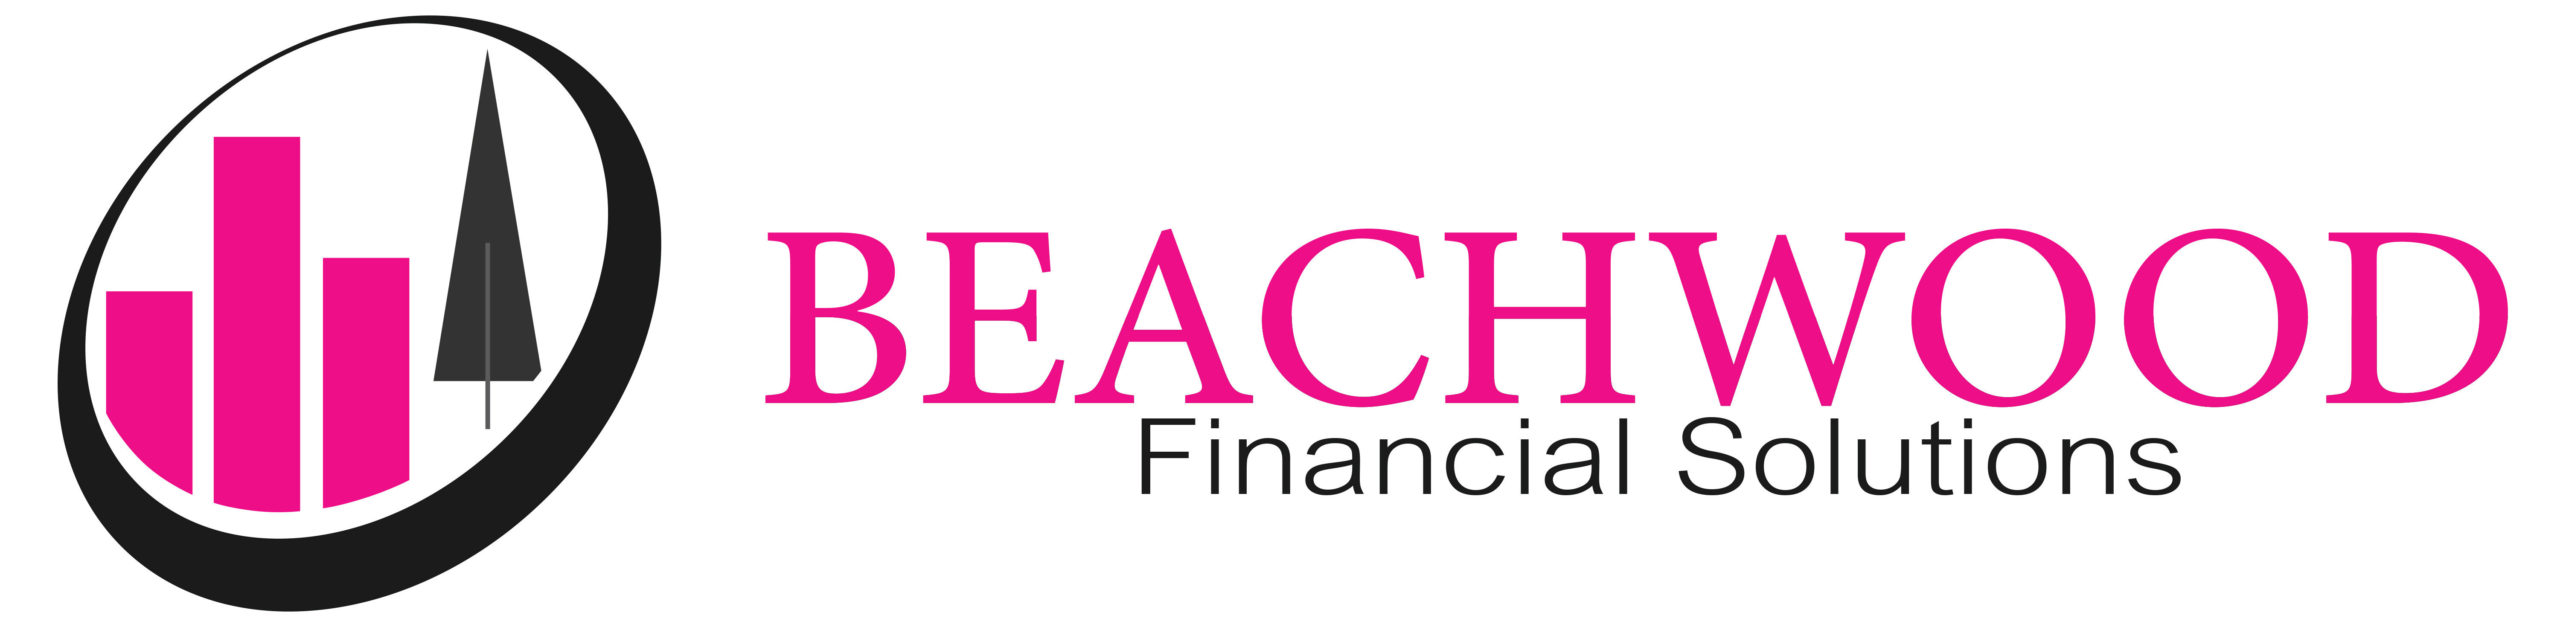 Beachwood Financial Solutions